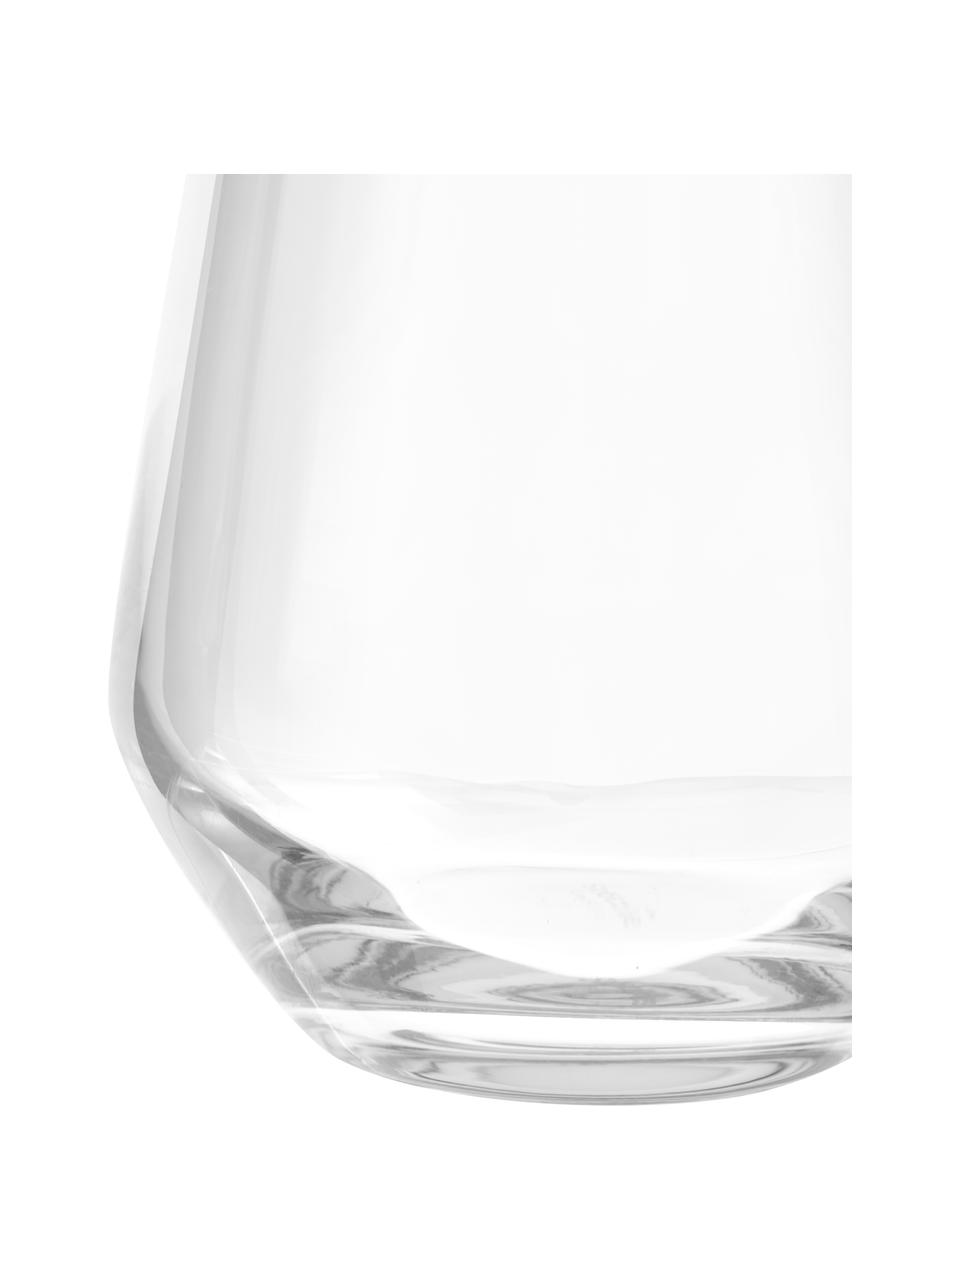 Bauchige kristalglazenwaterglazen Revolution, 6er-set, Kristalglas, Transparant, Ø 9 x H 11 cm